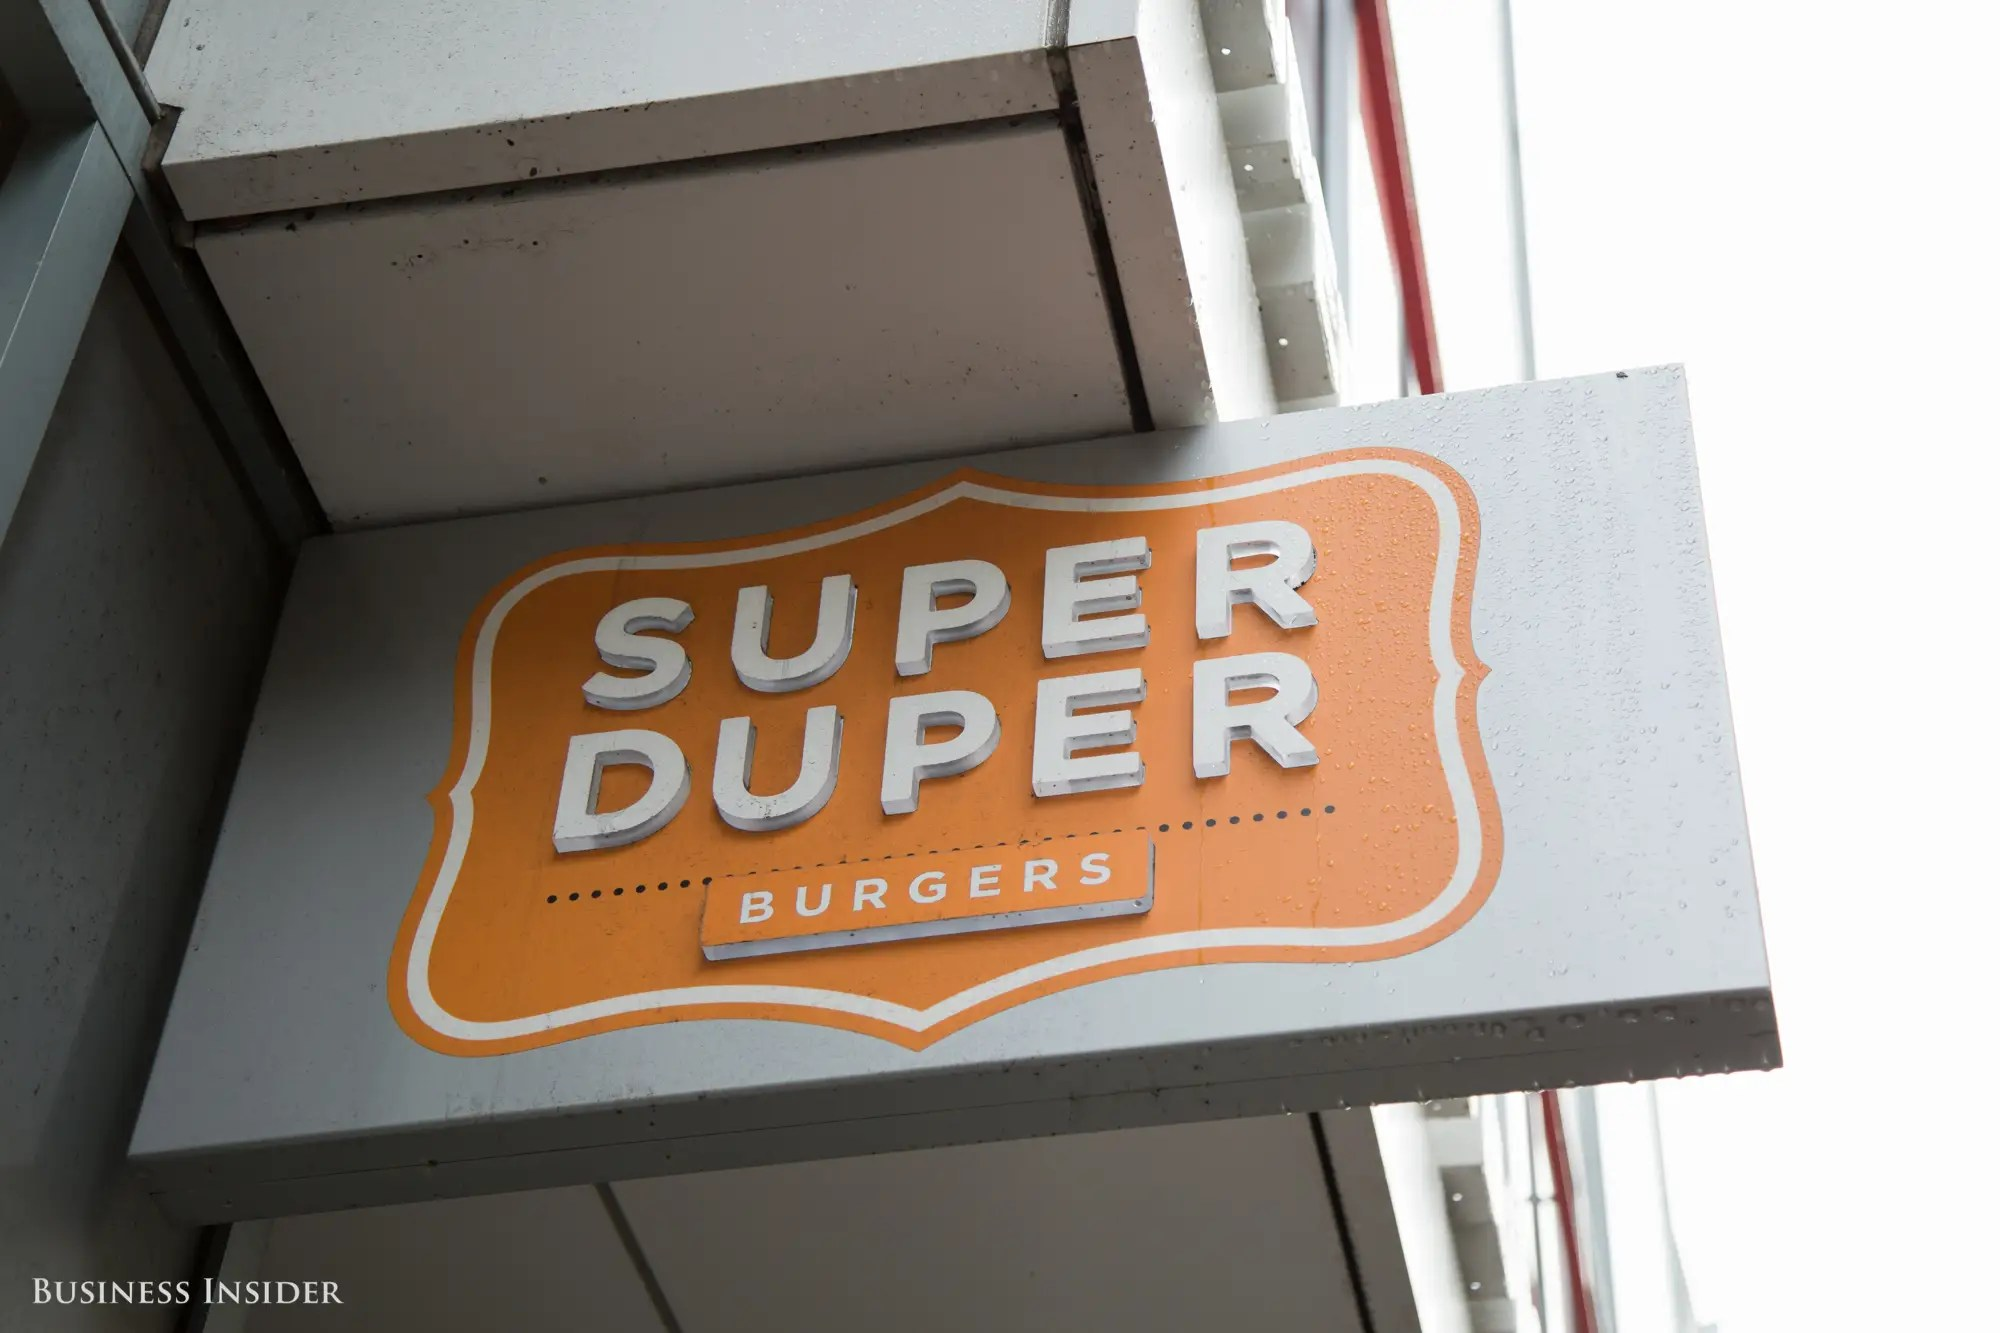 San Francisco S Super Duper Burger Review And Photos